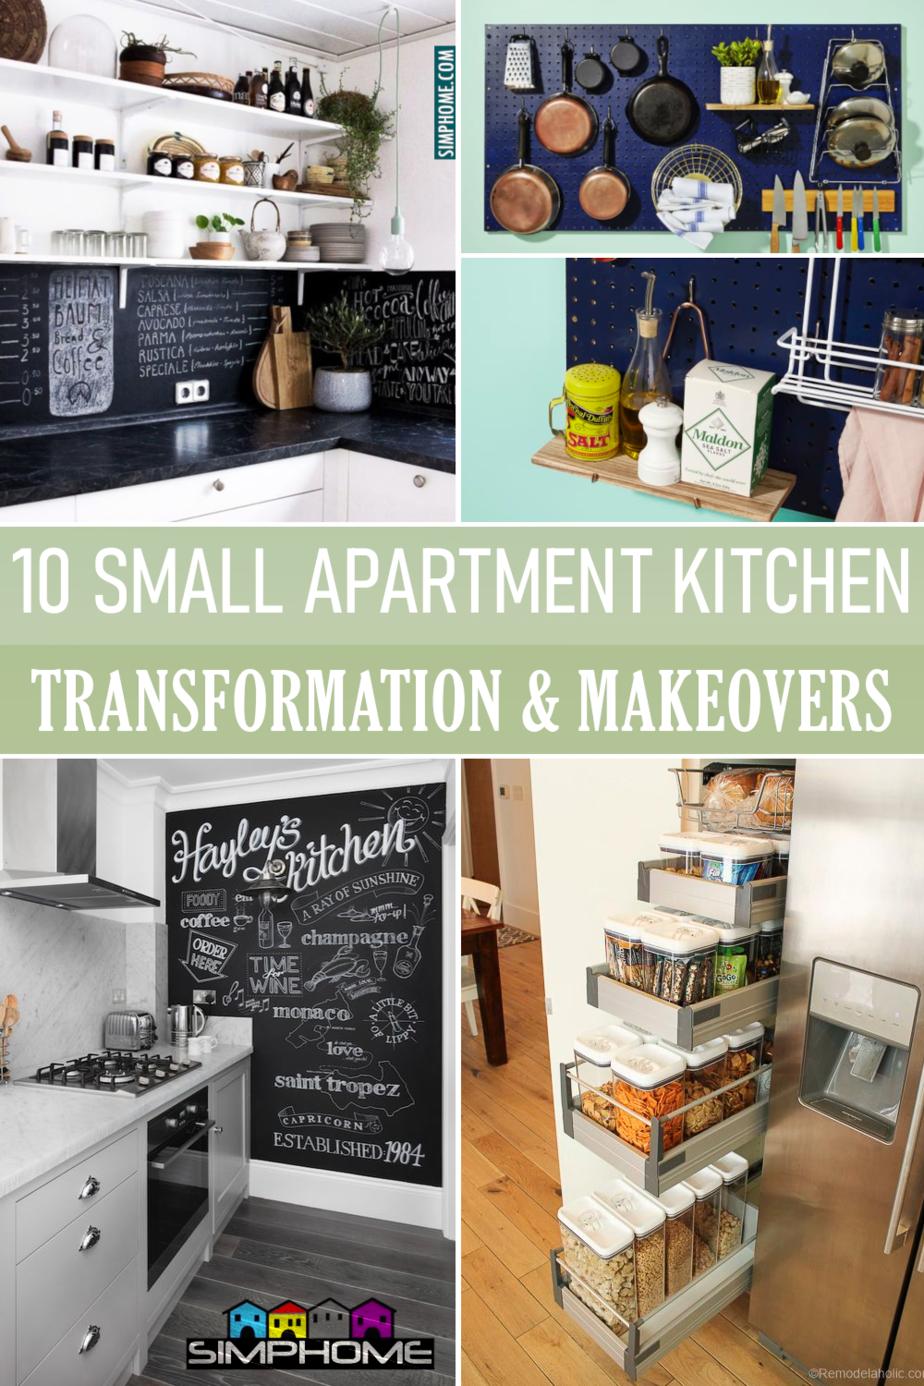 Small Apartment Kitchen Ideas via Simphome.comFeatured Image